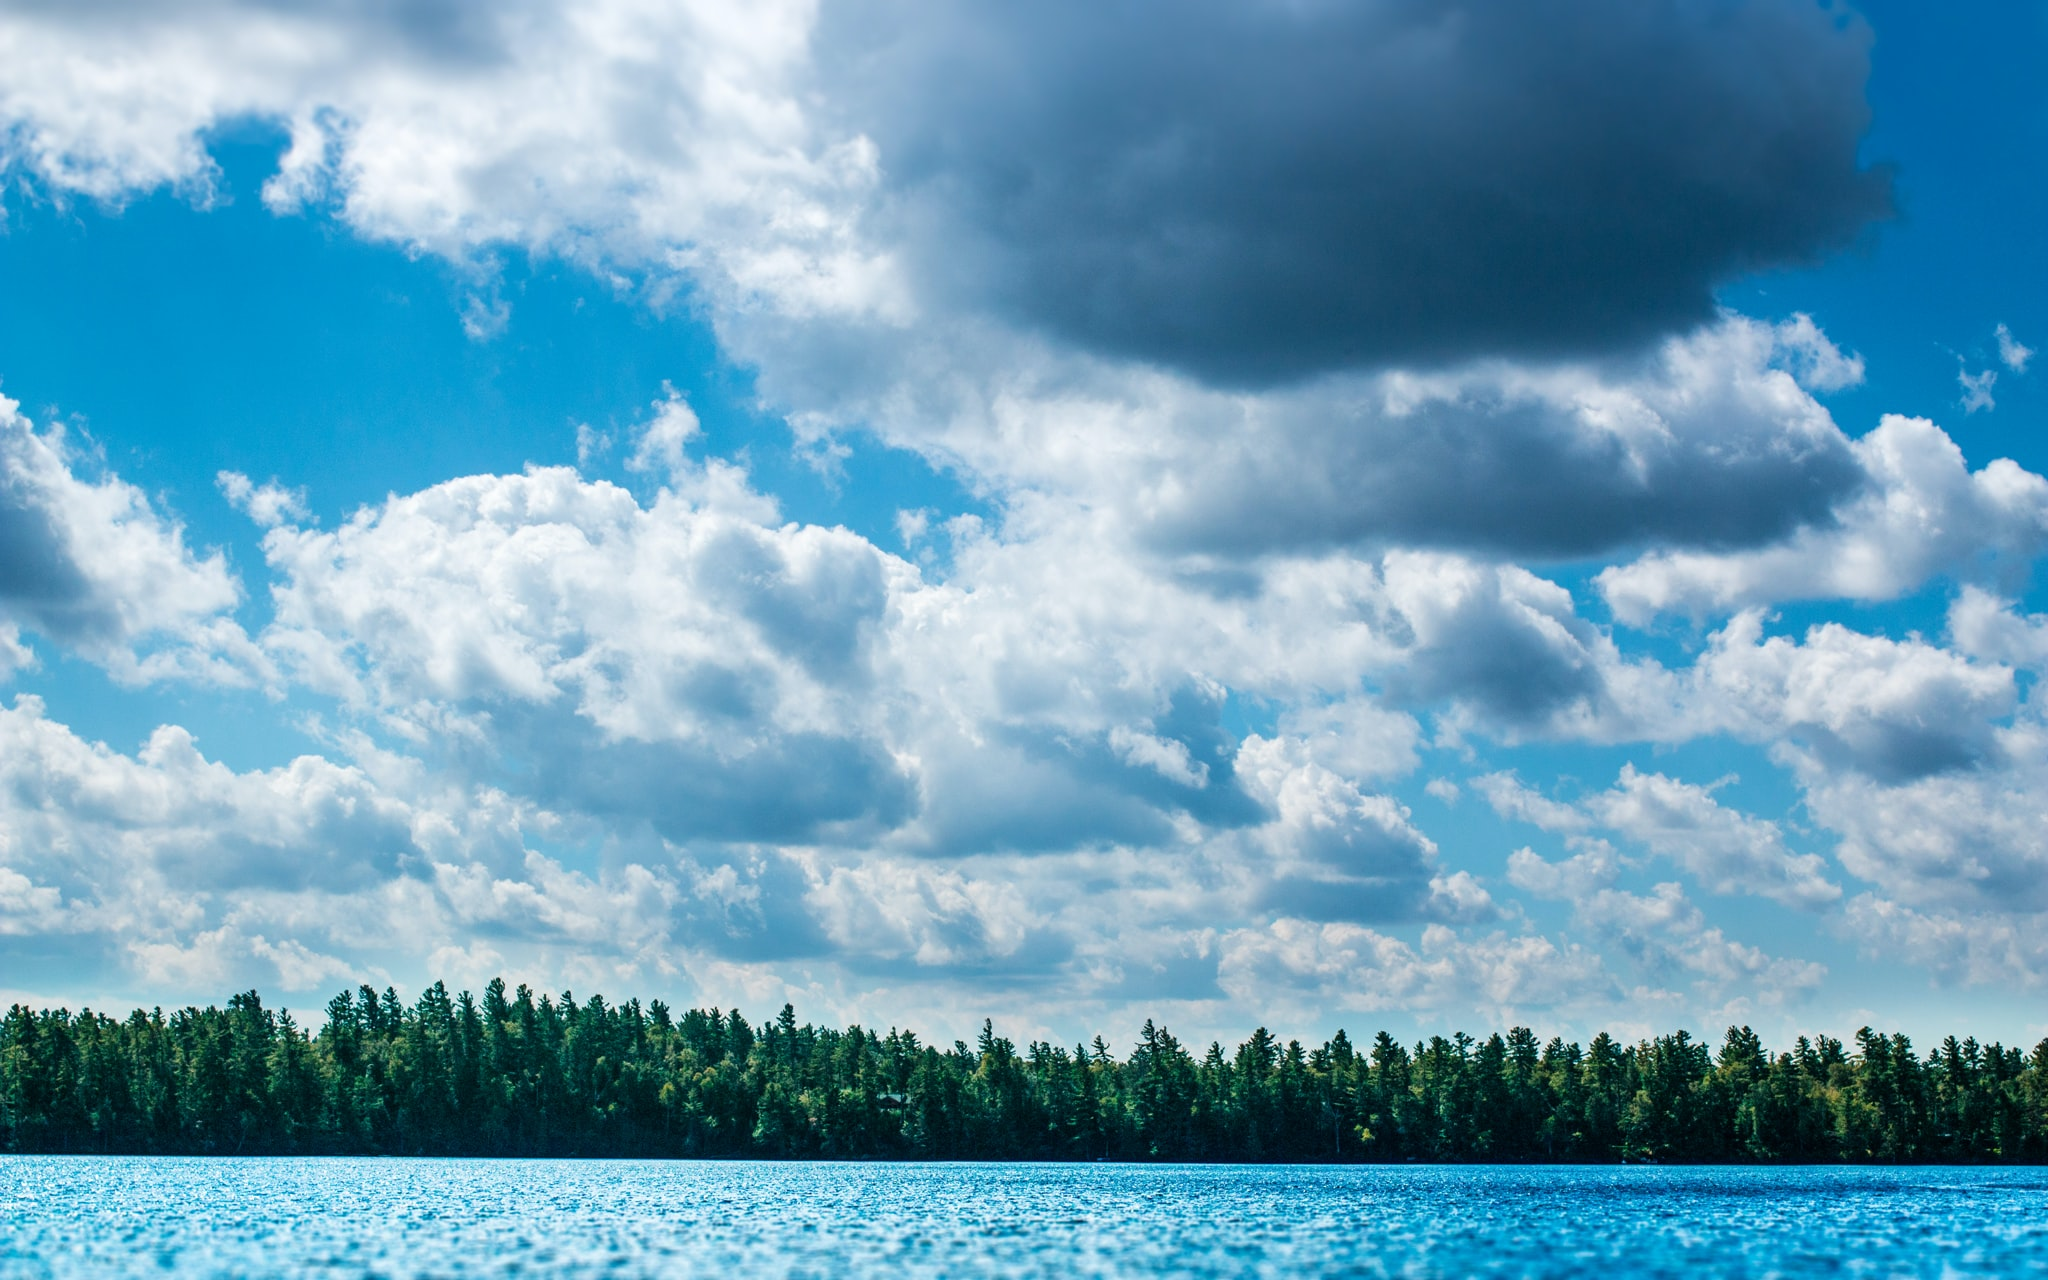 Heavy white clouds over a choppy blue lake